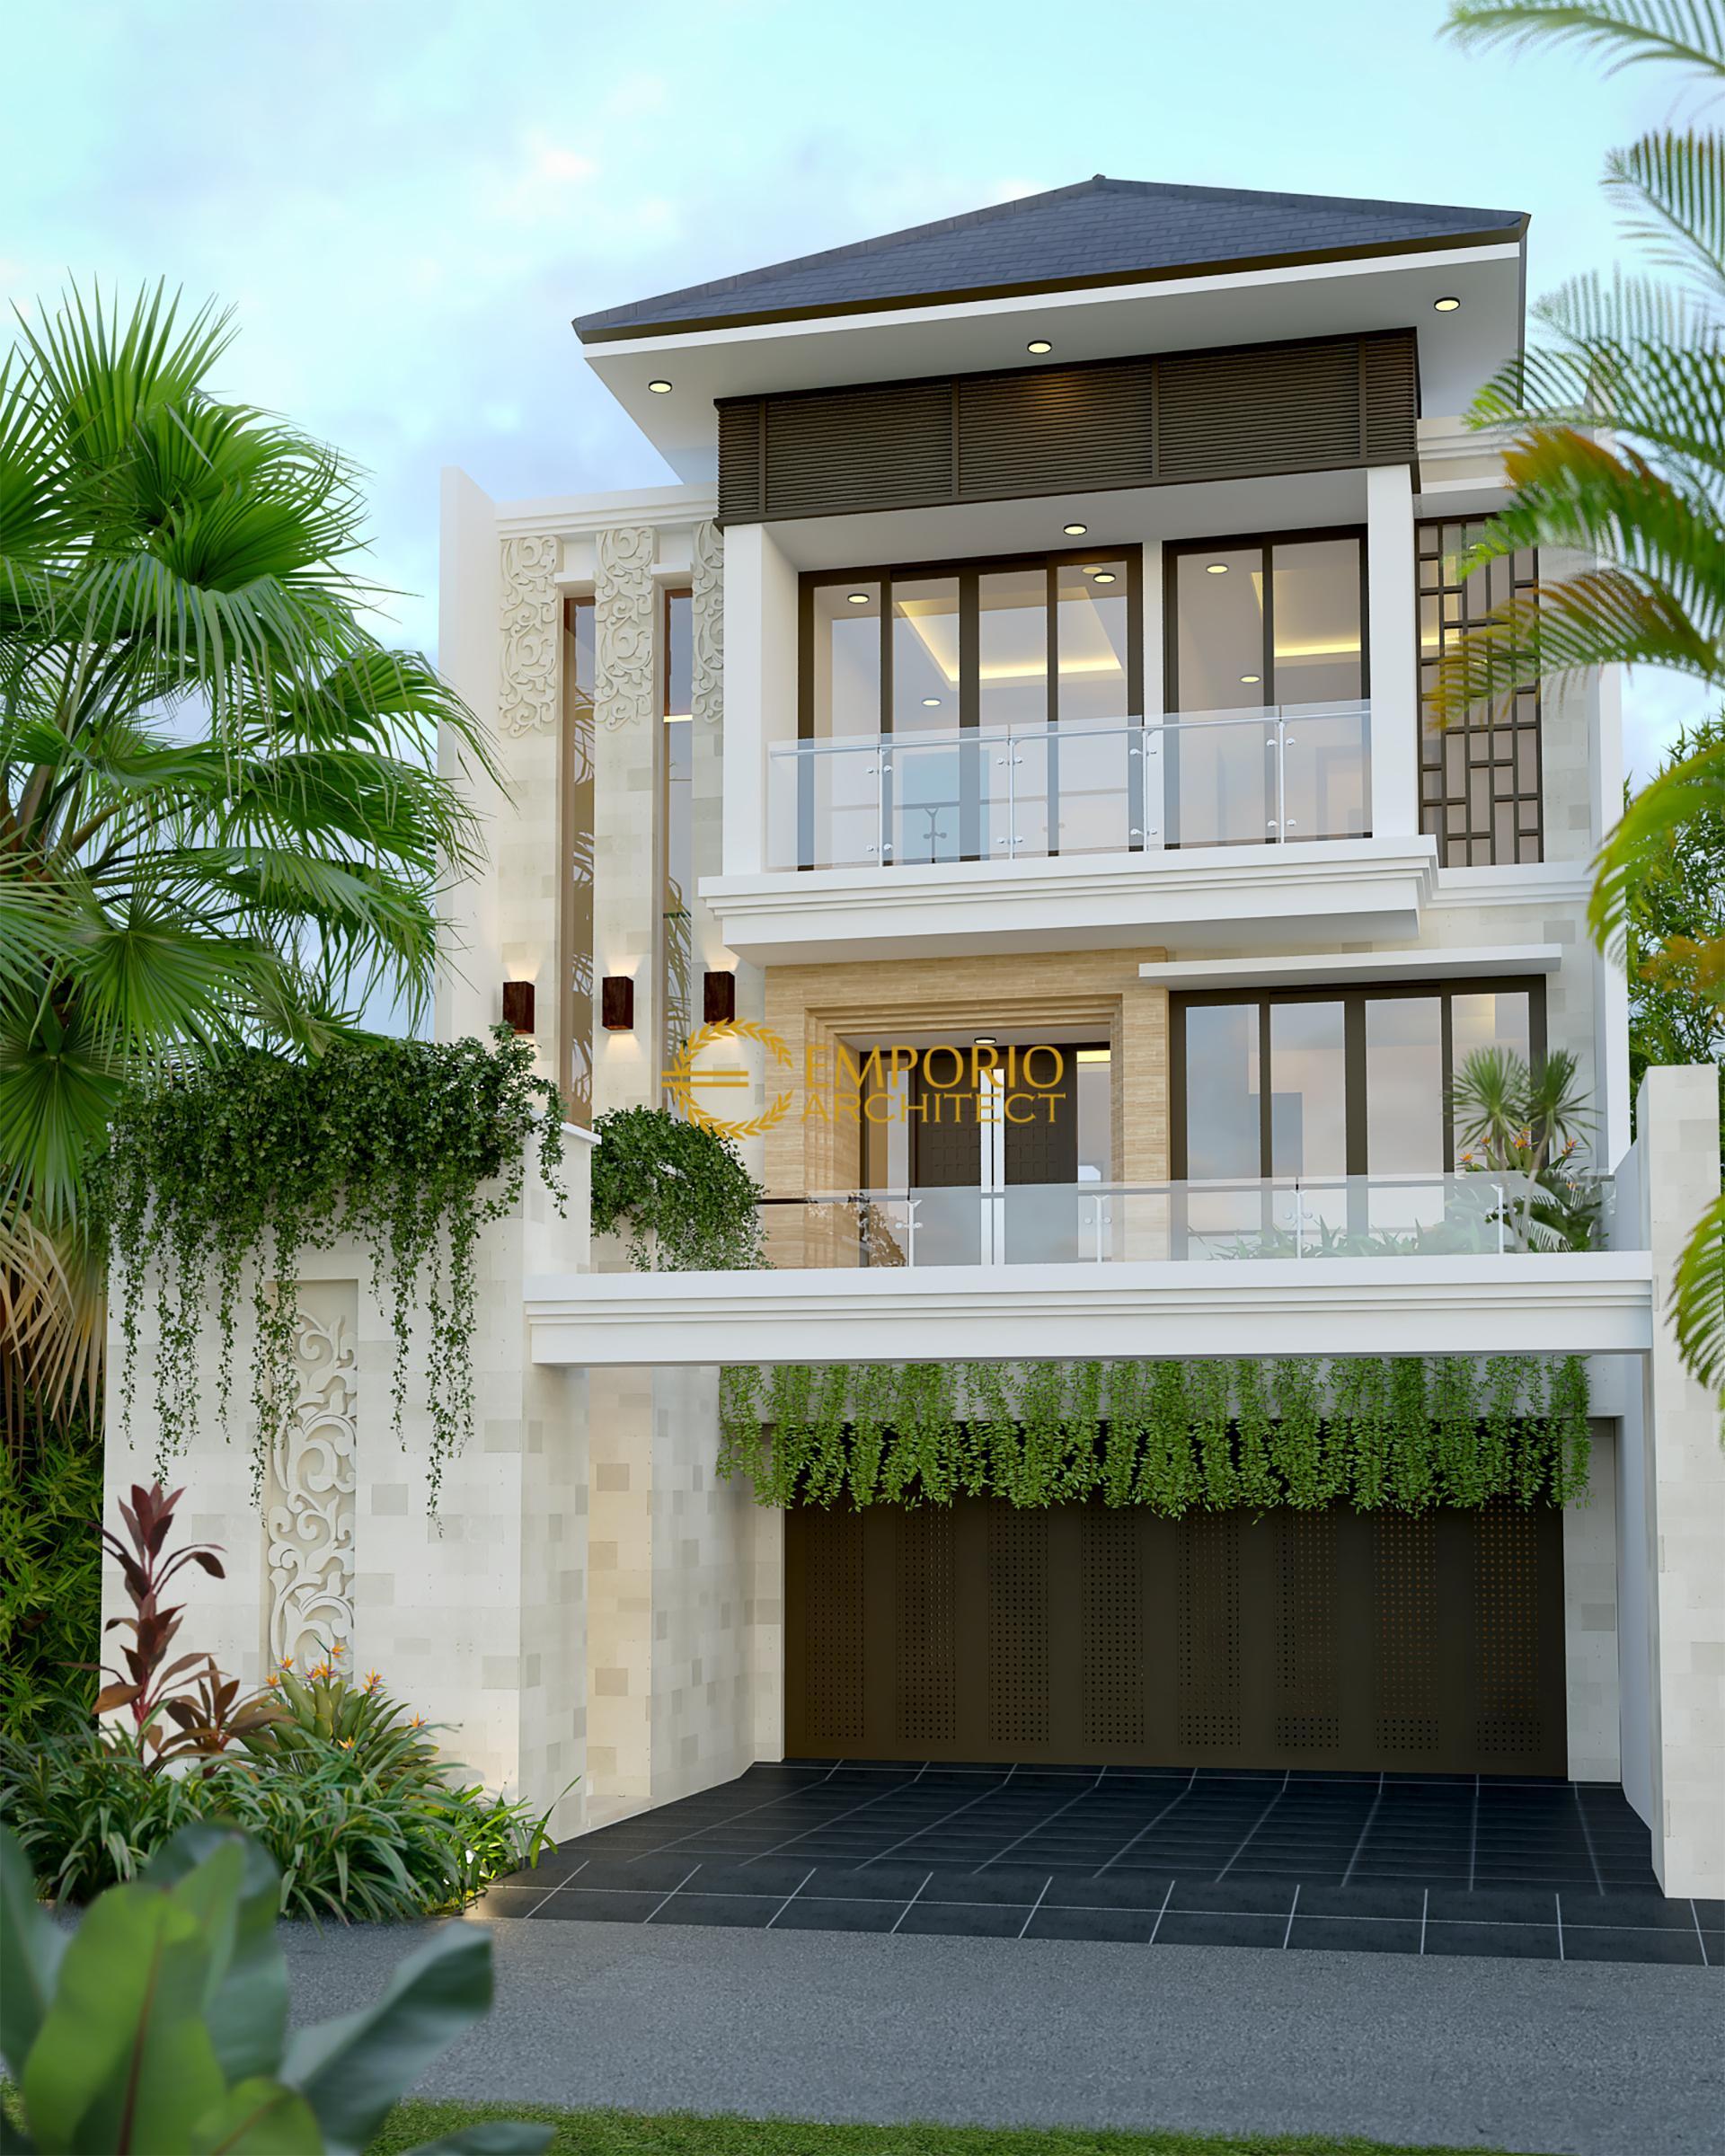 Desain Rumah Villa Bali 3 Lantai Bapak Suhendar di  Jakarta